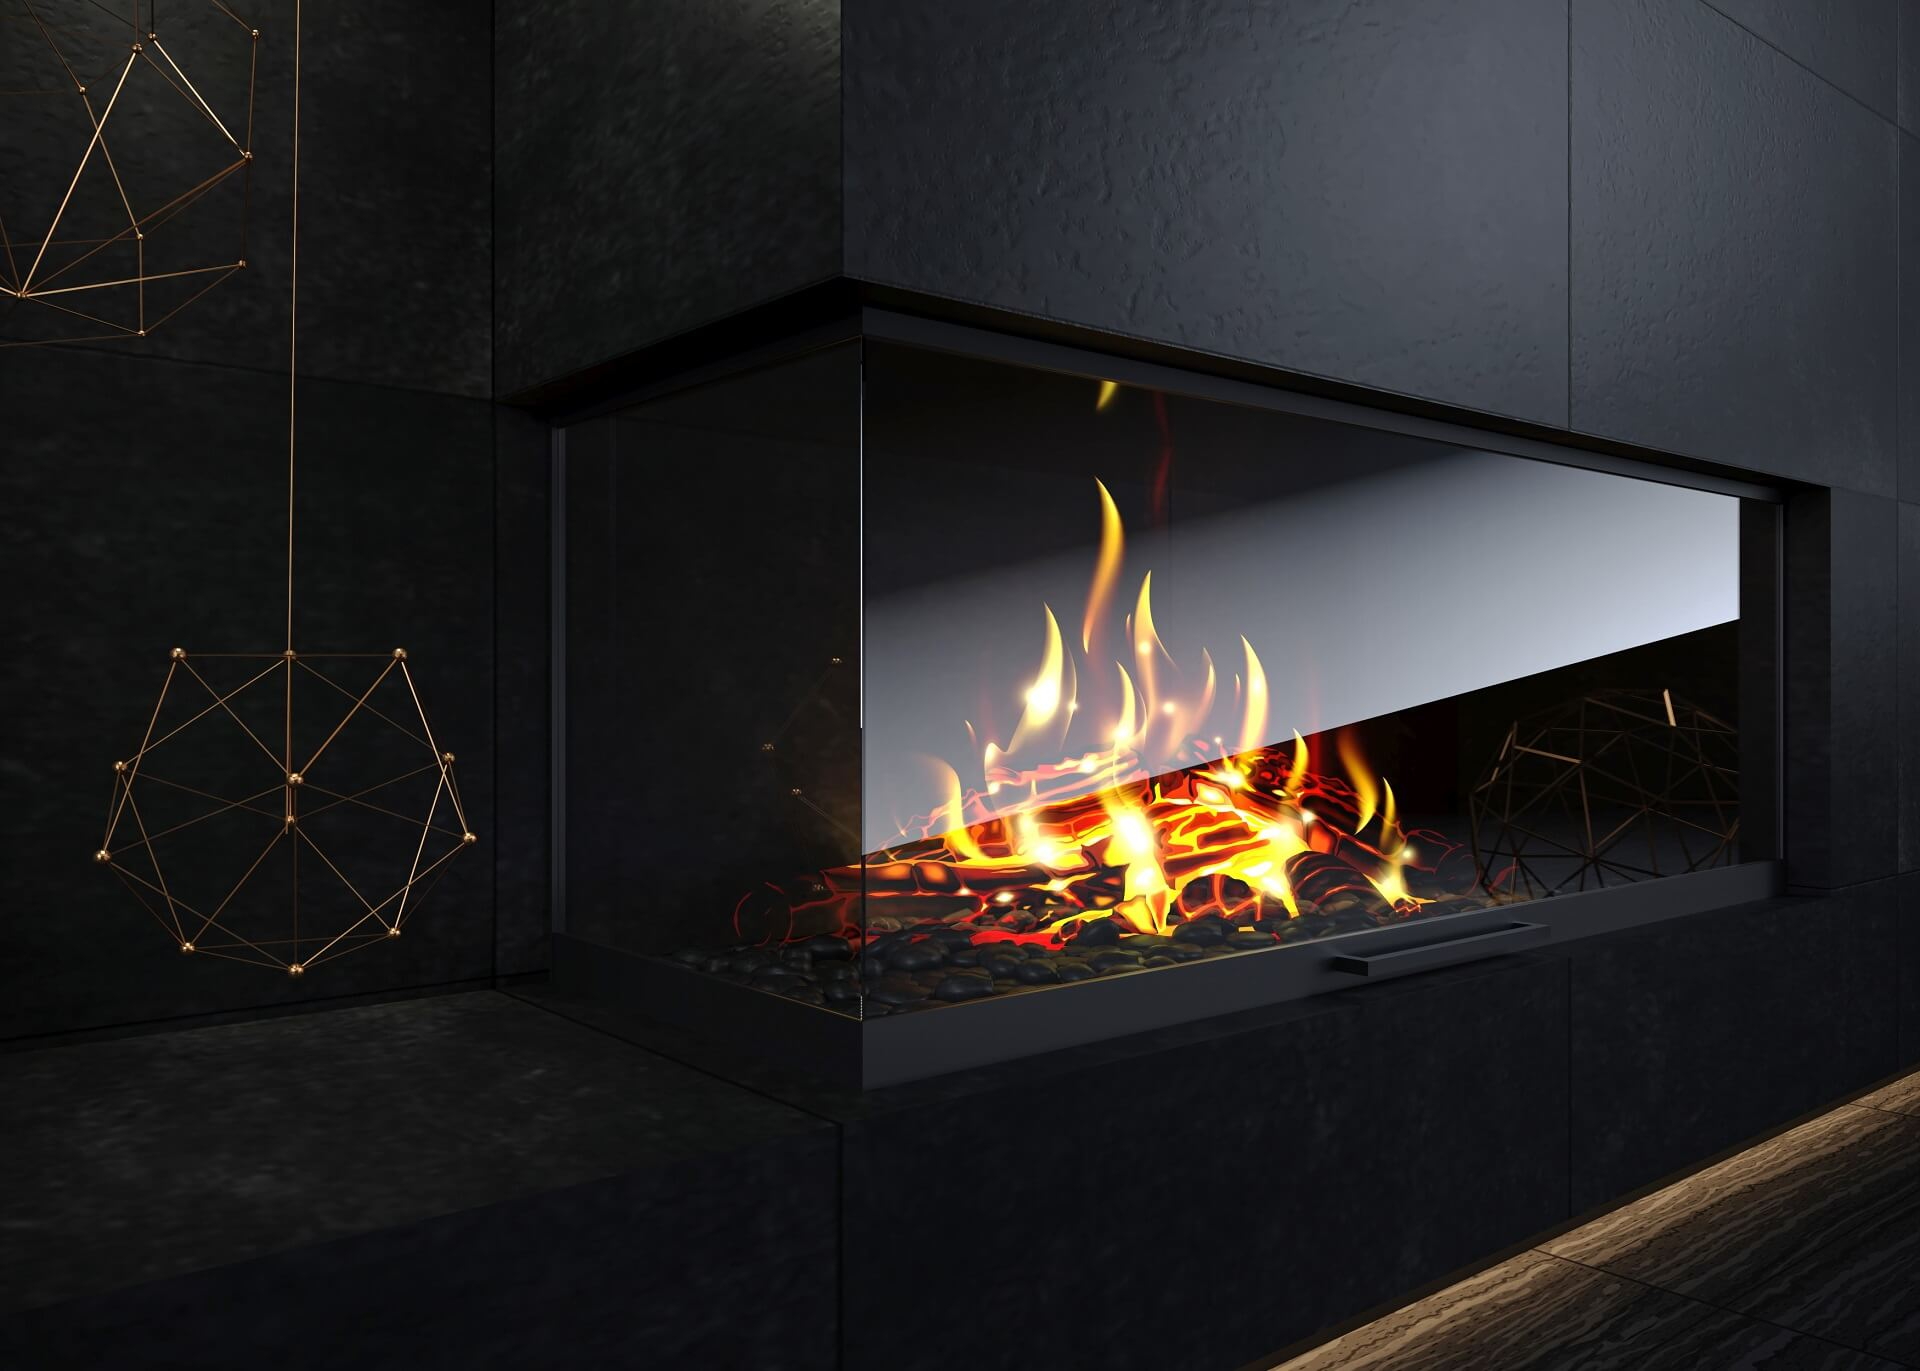 Fireplace trends 2021: most popular design ideas